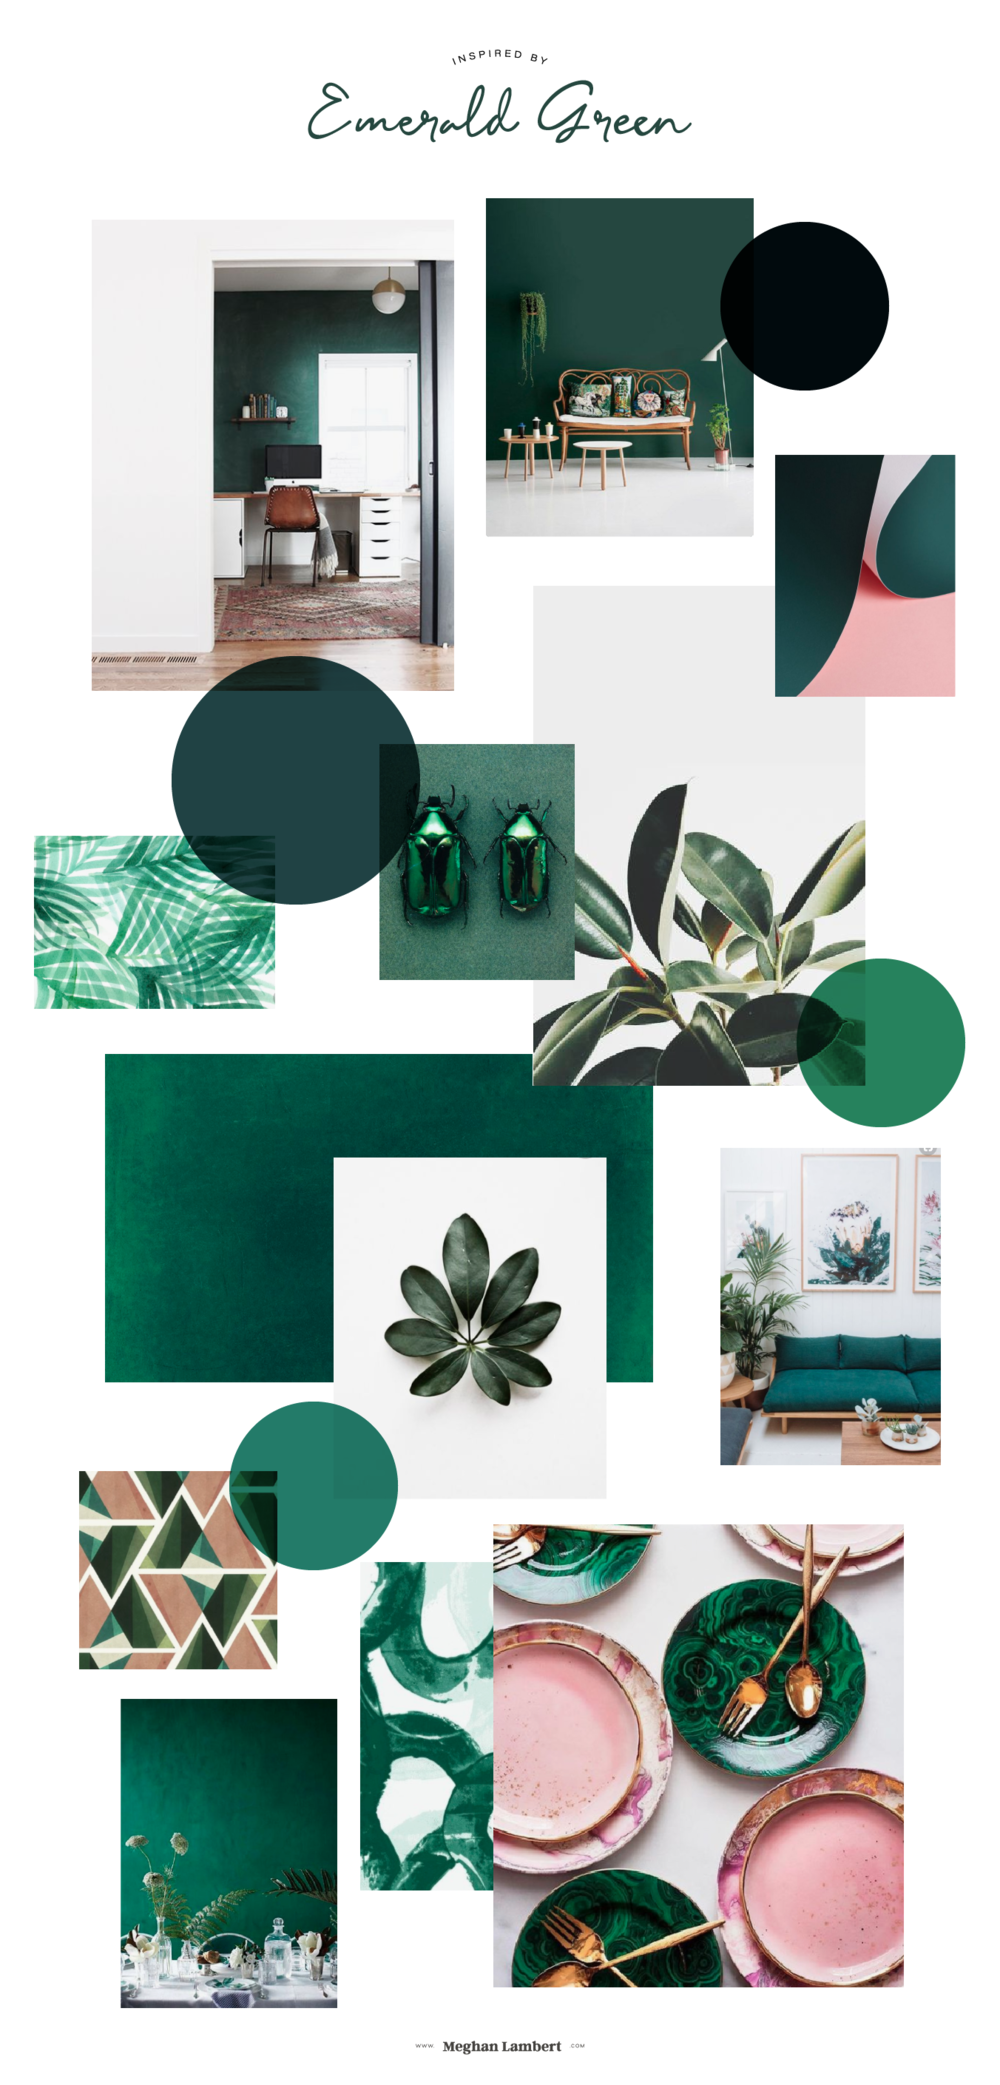 Inspired by Emerald Green from MeghanLambert.com